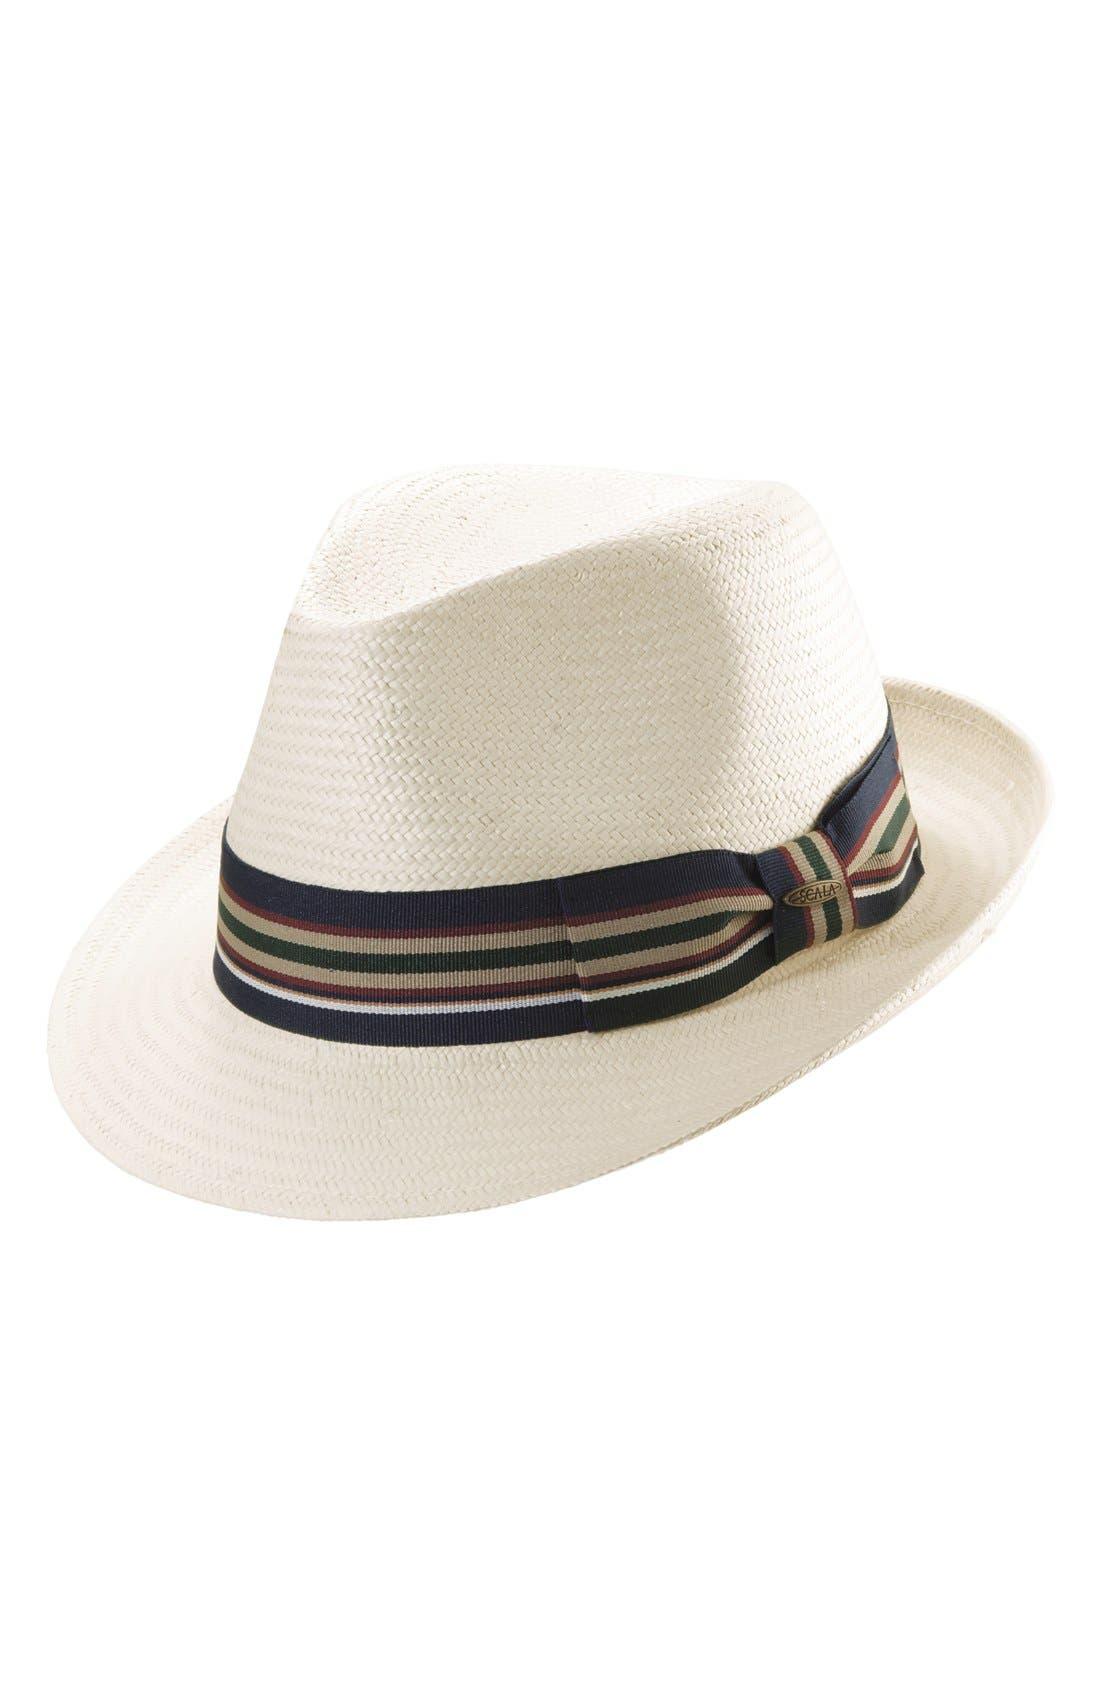 1950s Men's Clothing Mens Scala Straw Trilby - White $32.25 AT vintagedancer.com